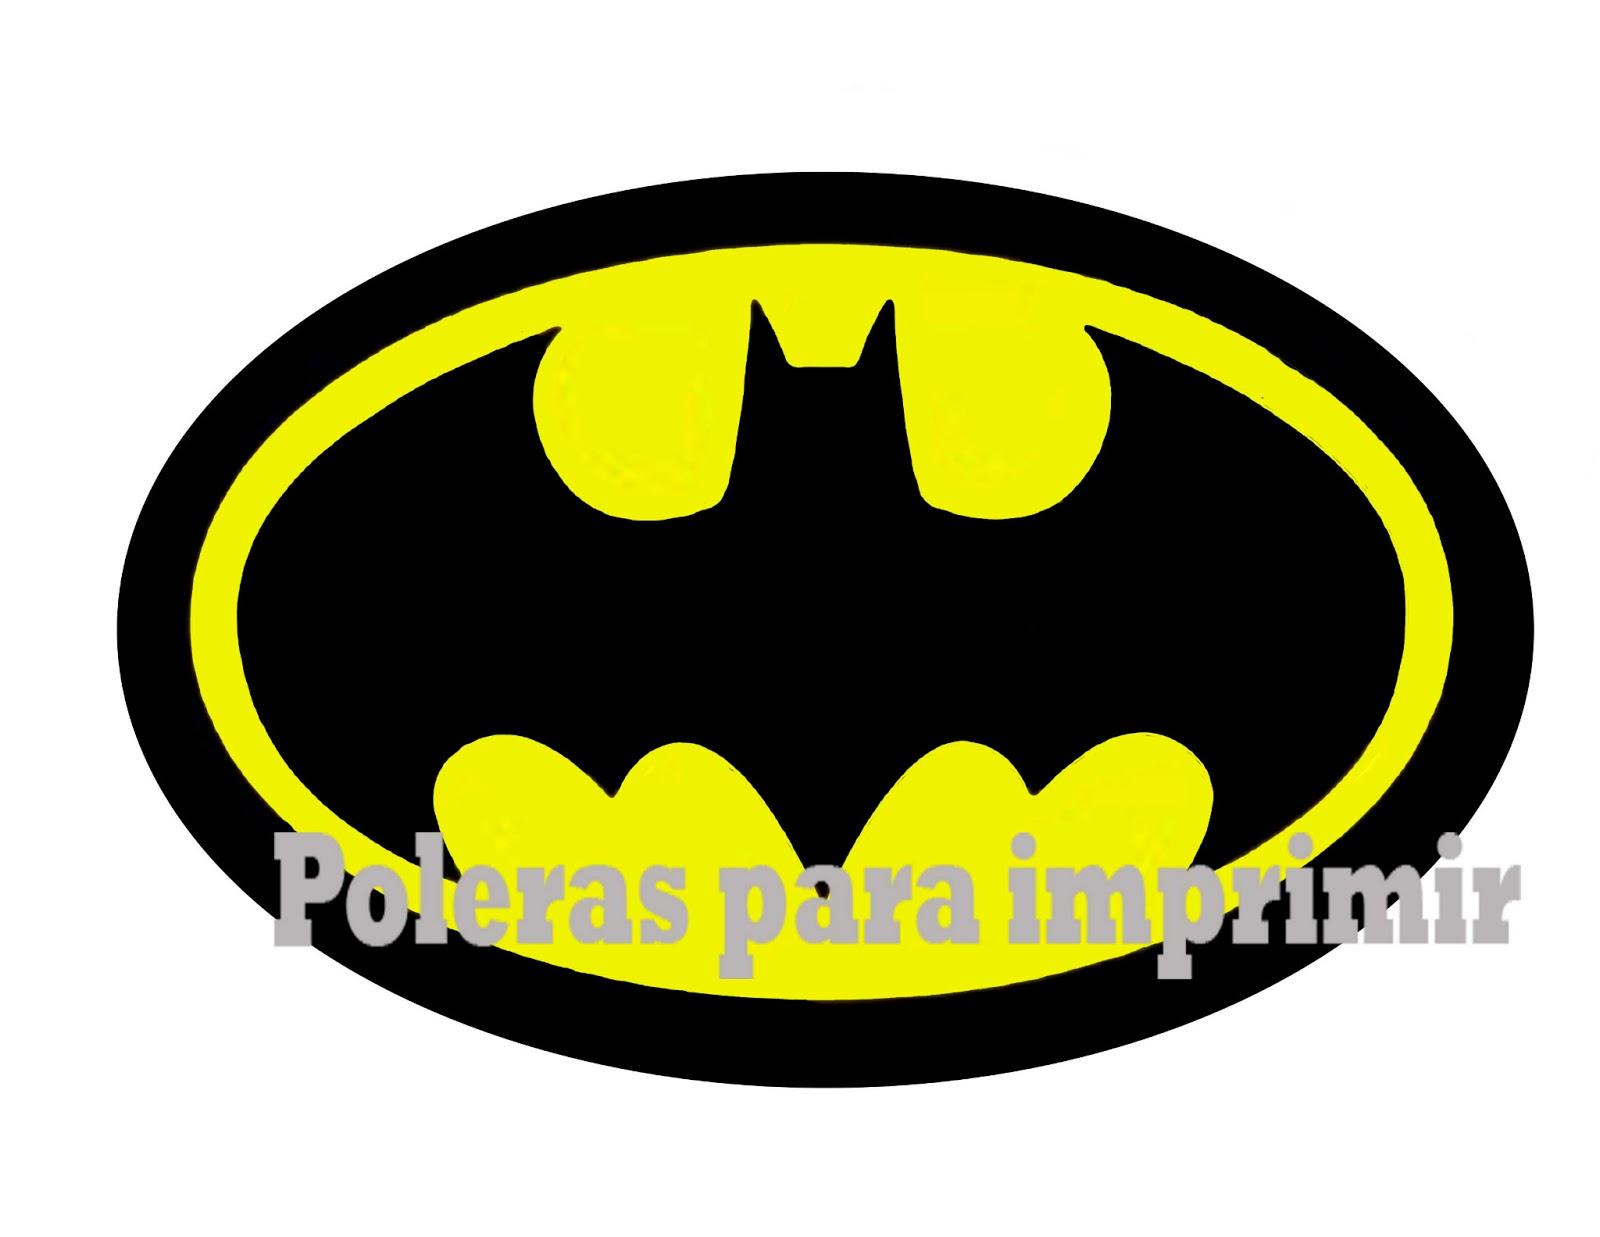 Poleras para imprimir: Super Heroes